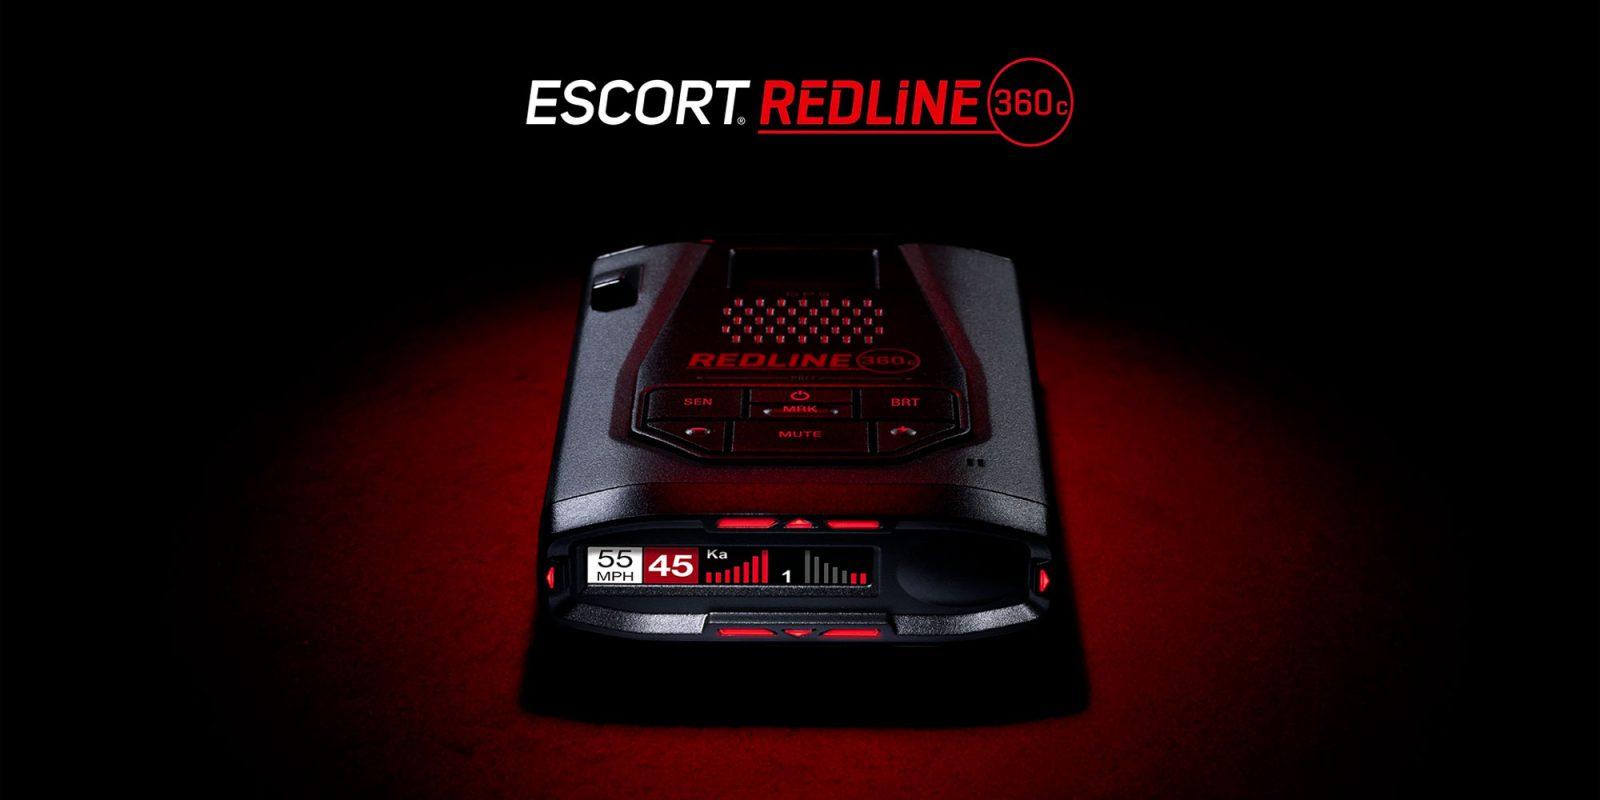 Are Radar Detectors Legal >> ESCORT's latest Redline 360c radar detector offers 2X range - 9to5Toys